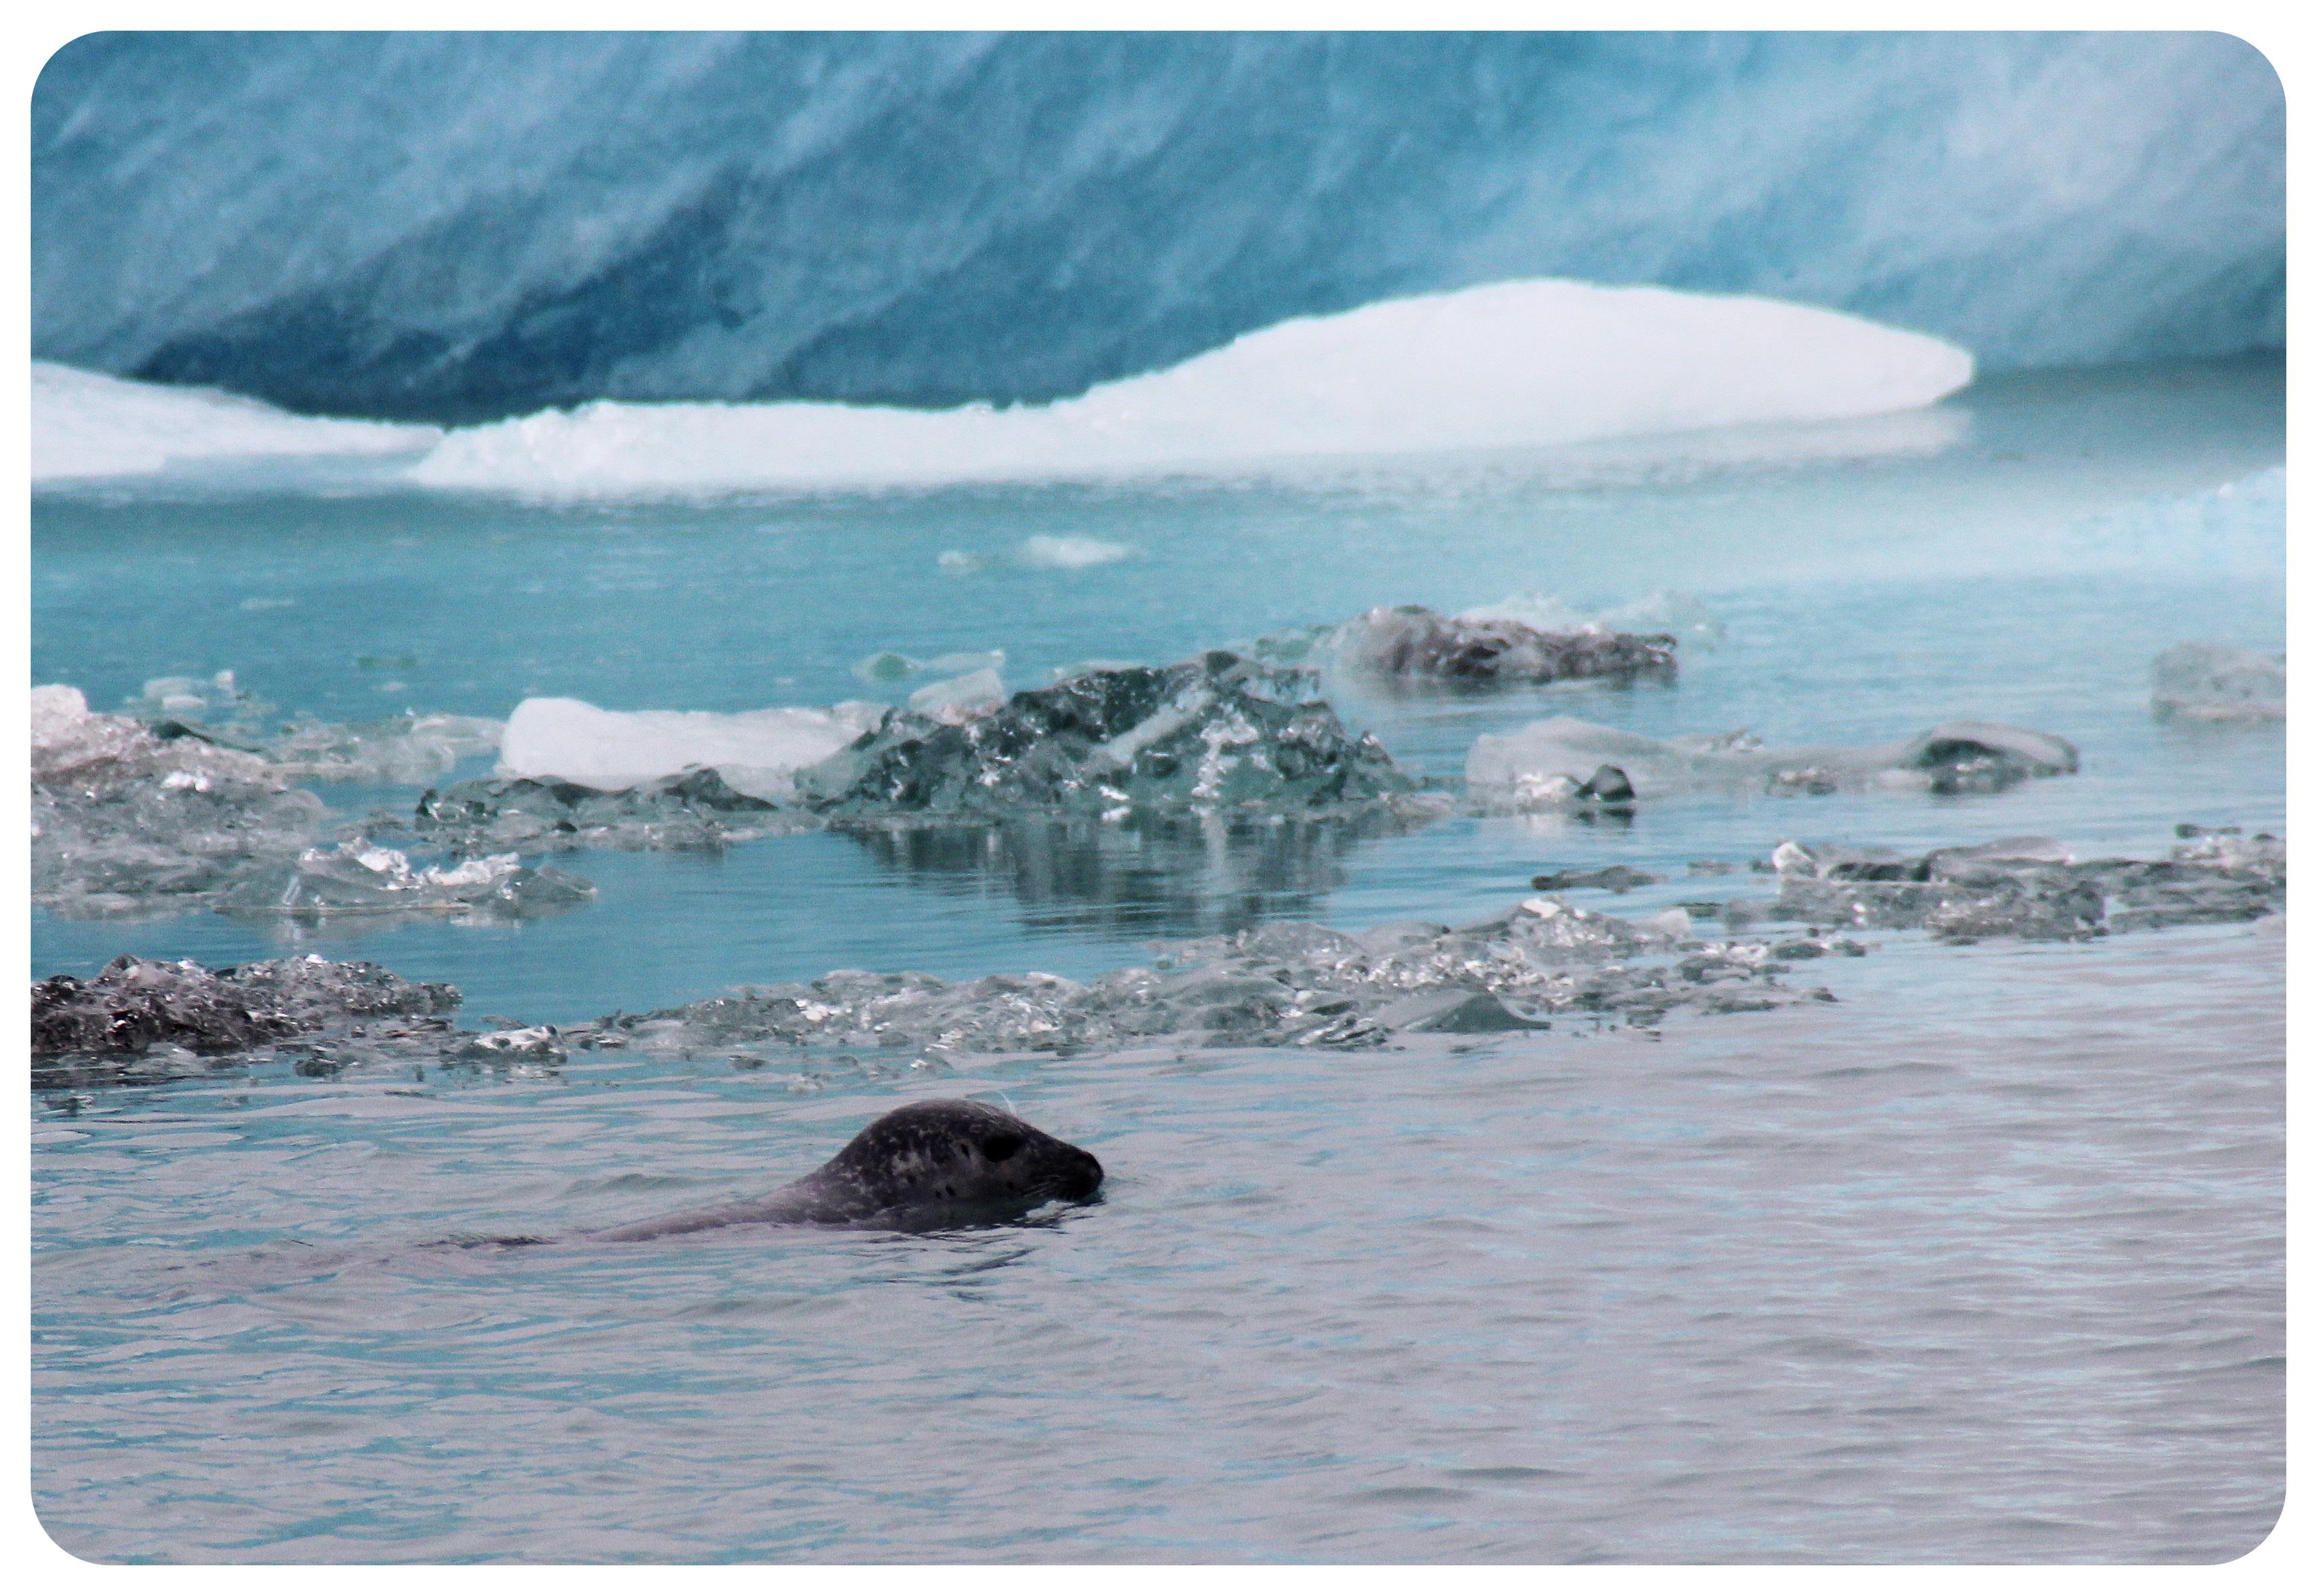 glacier lagoon ice iceland seal